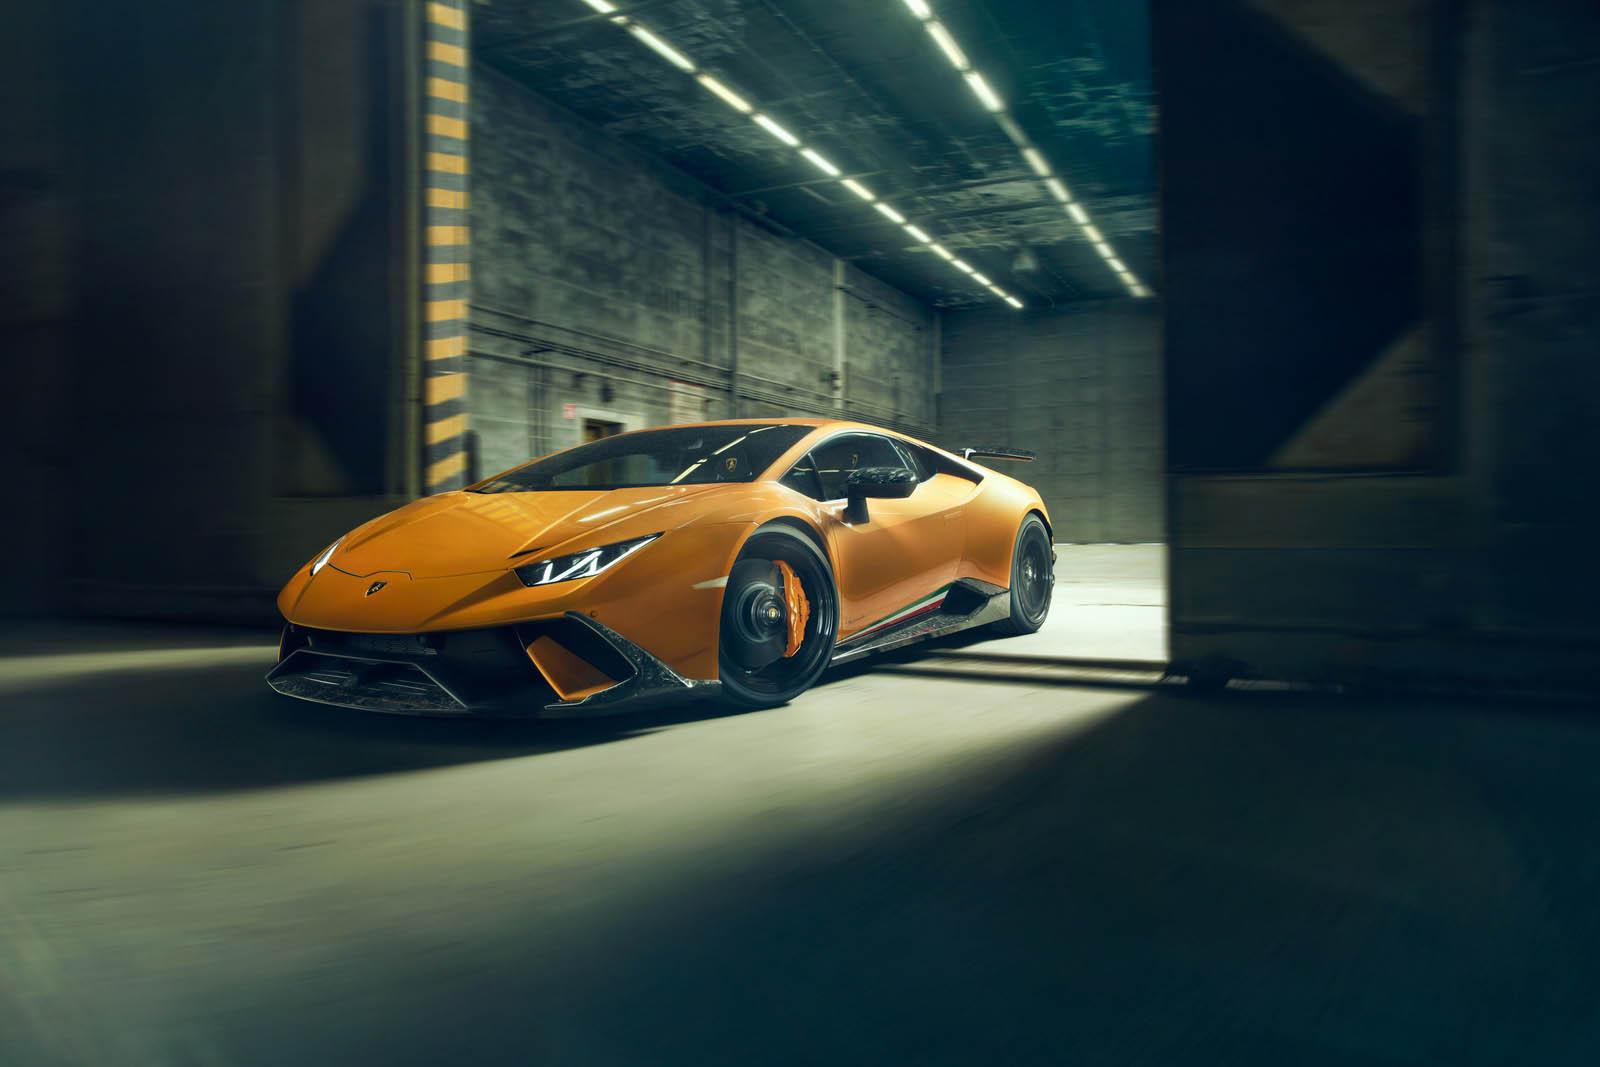 2018 Novitec Lamborghini Huracan Performante Wallpapers 17 Hd